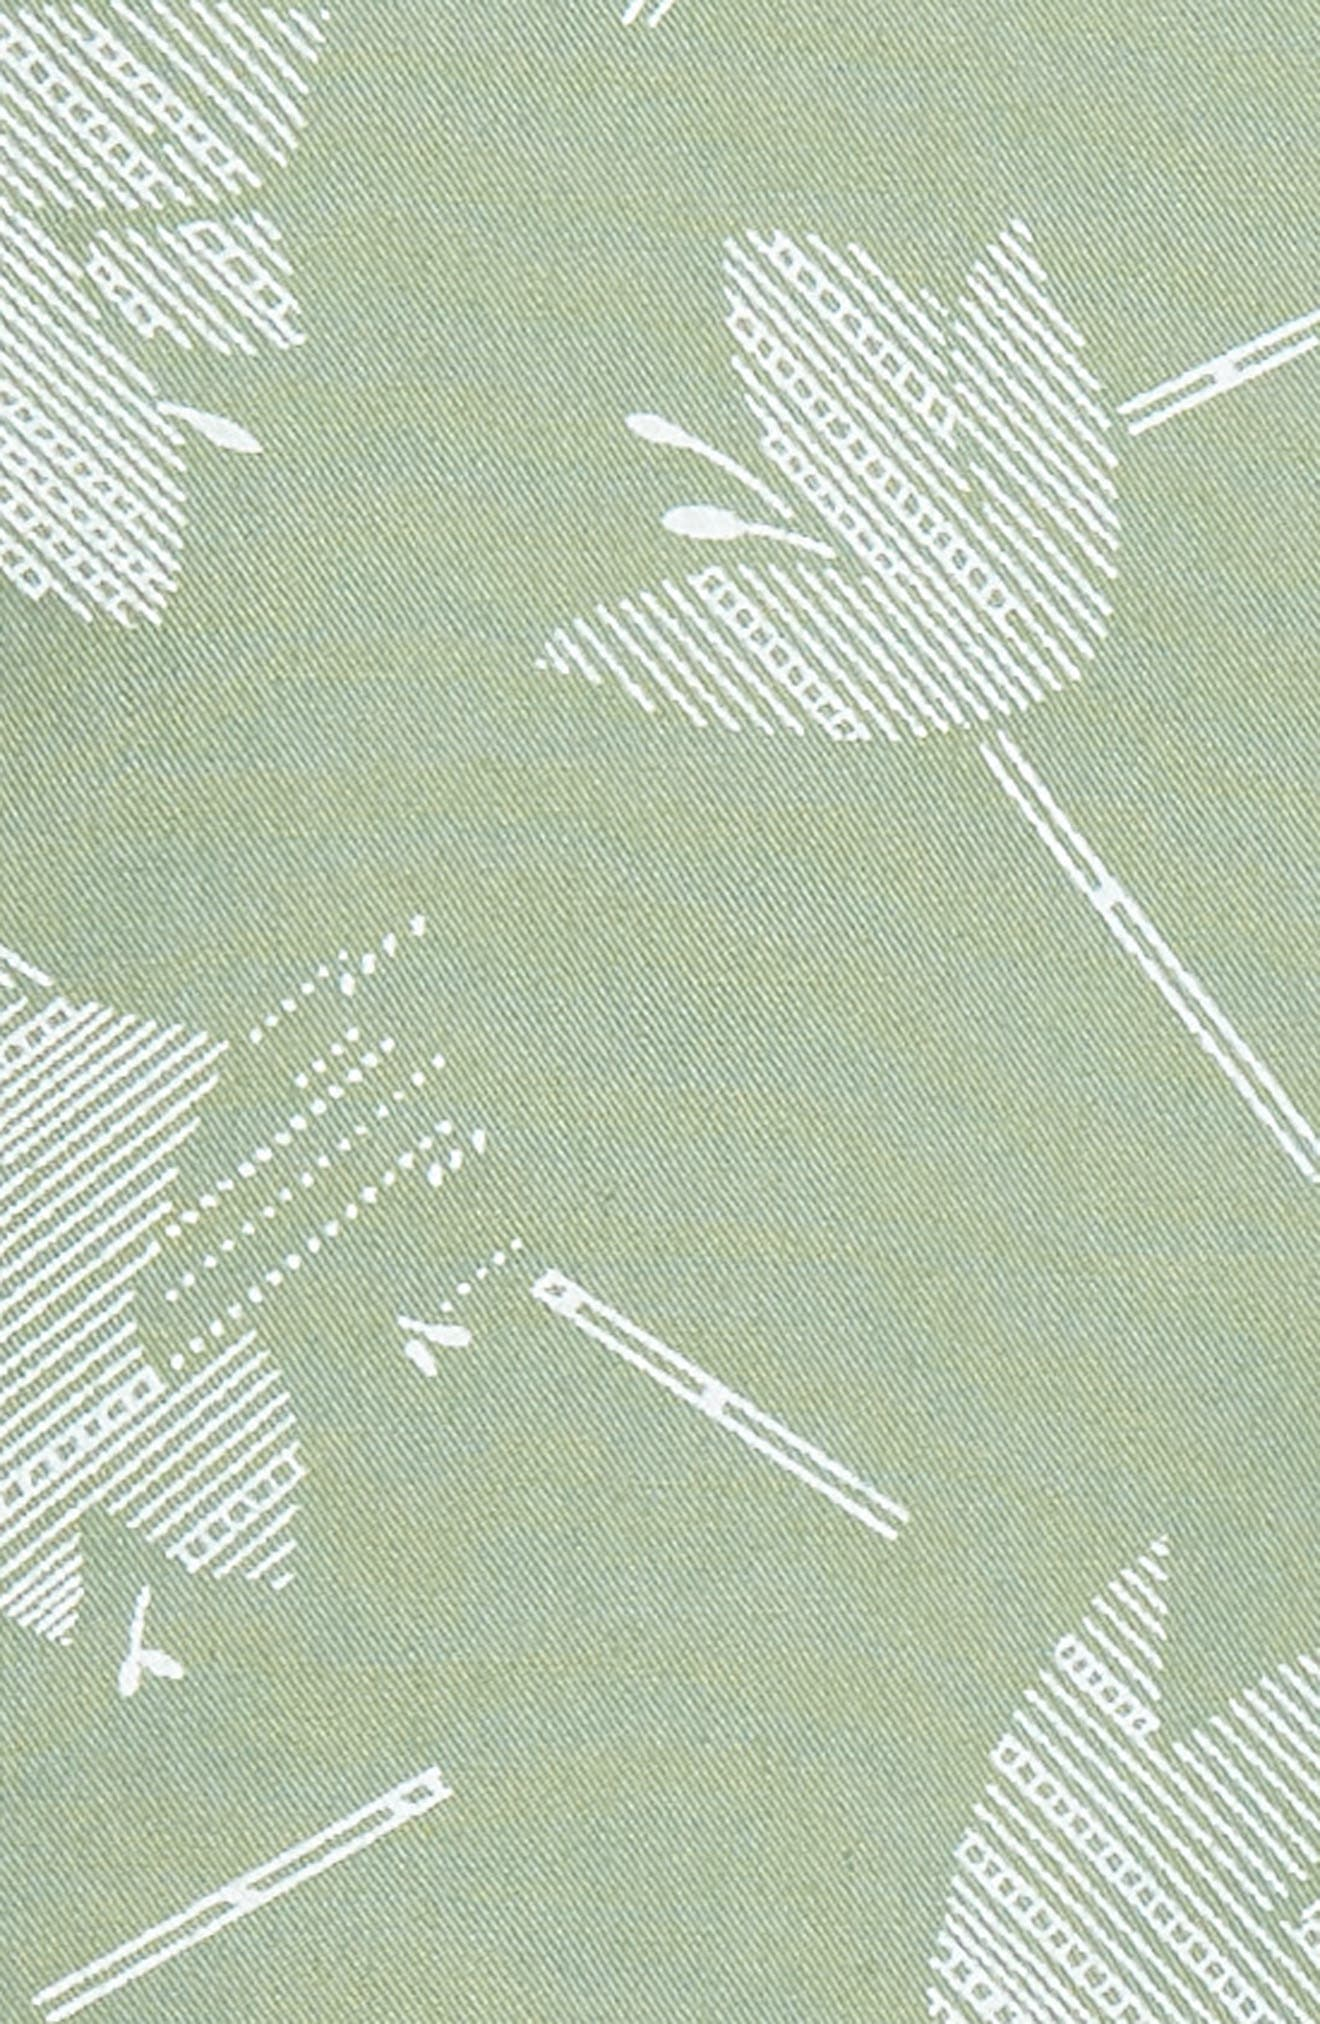 Deco Floral Print Shorts,                             Alternate thumbnail 5, color,                             Green Hedge Deco Floral